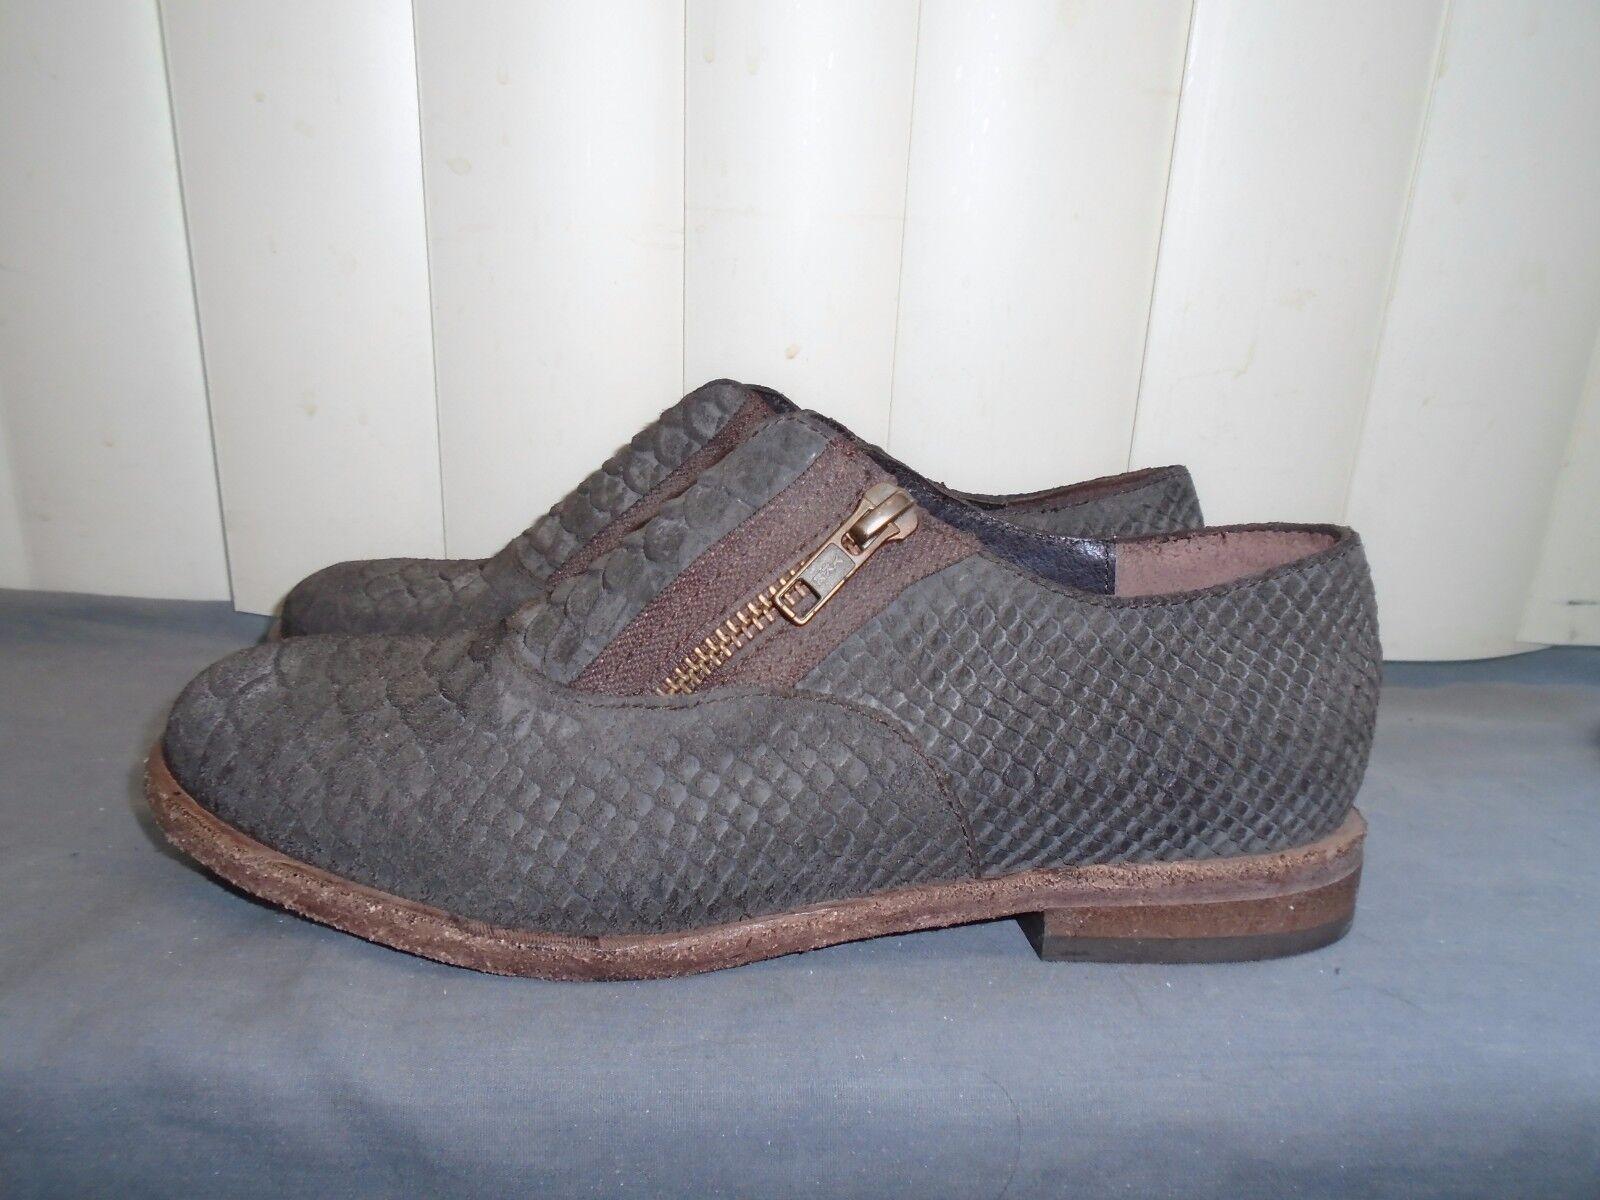 Free People Balboa Zip Darby Nero Croc Double Zip Balboa Oxfords Size EU 36 6 NWOB $148 7ff240